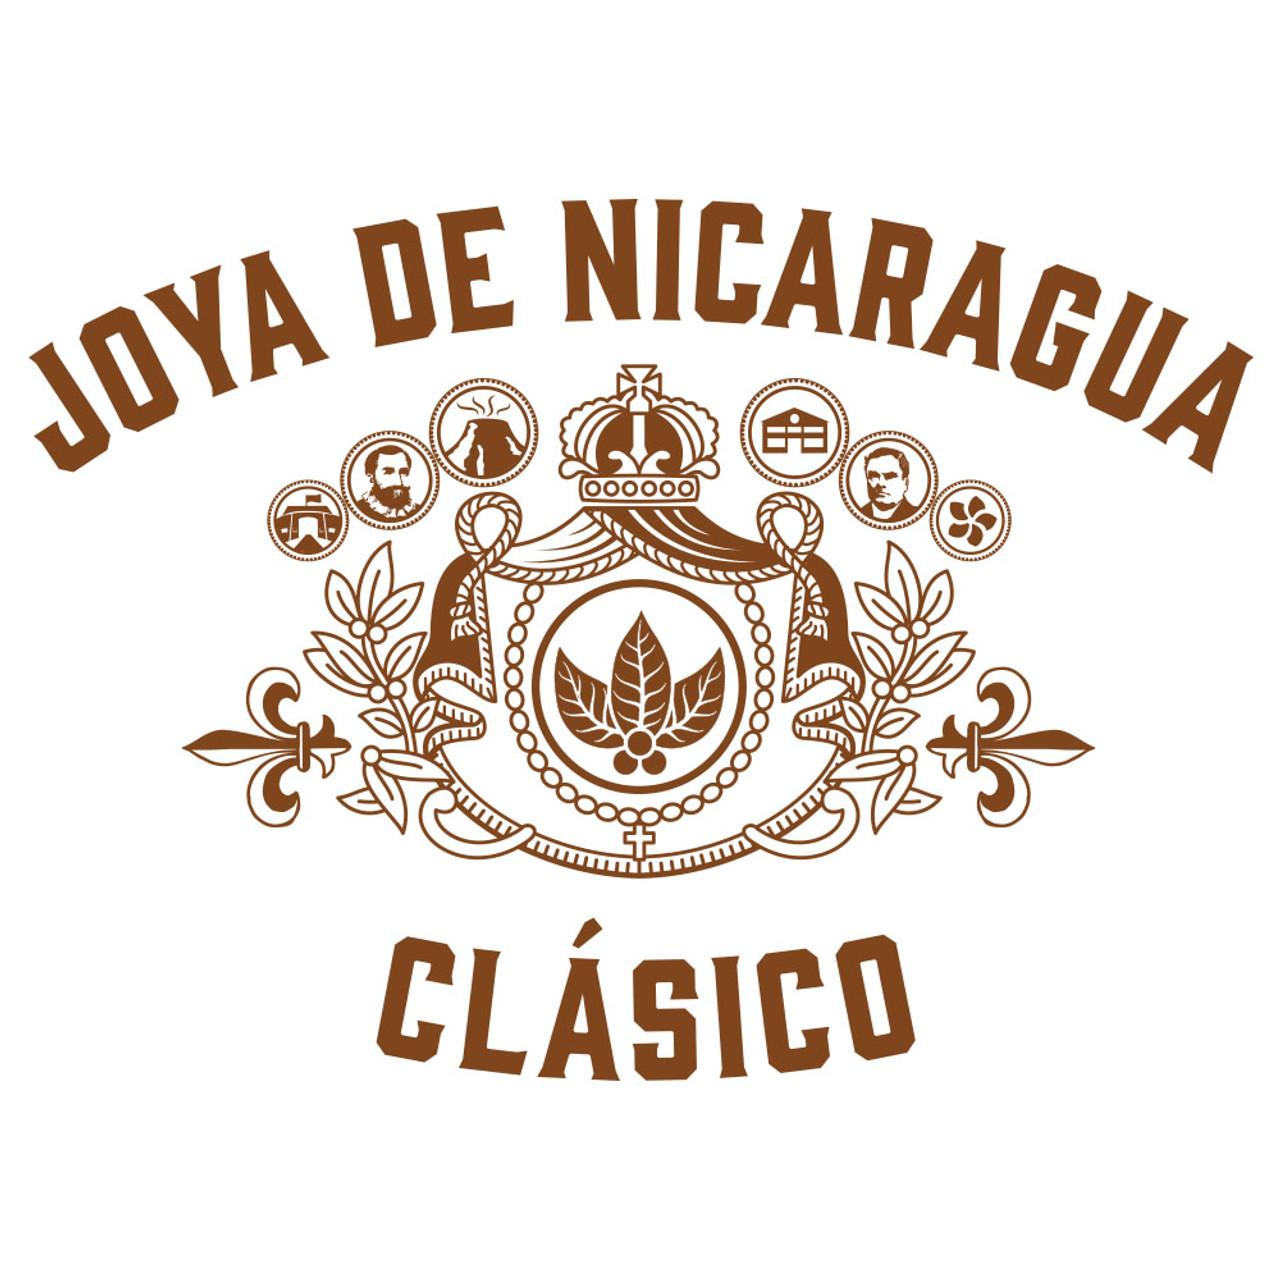 Joya de Nicaragua Clasico No. 6 Cigars - 6 x 41 (Box of 25)